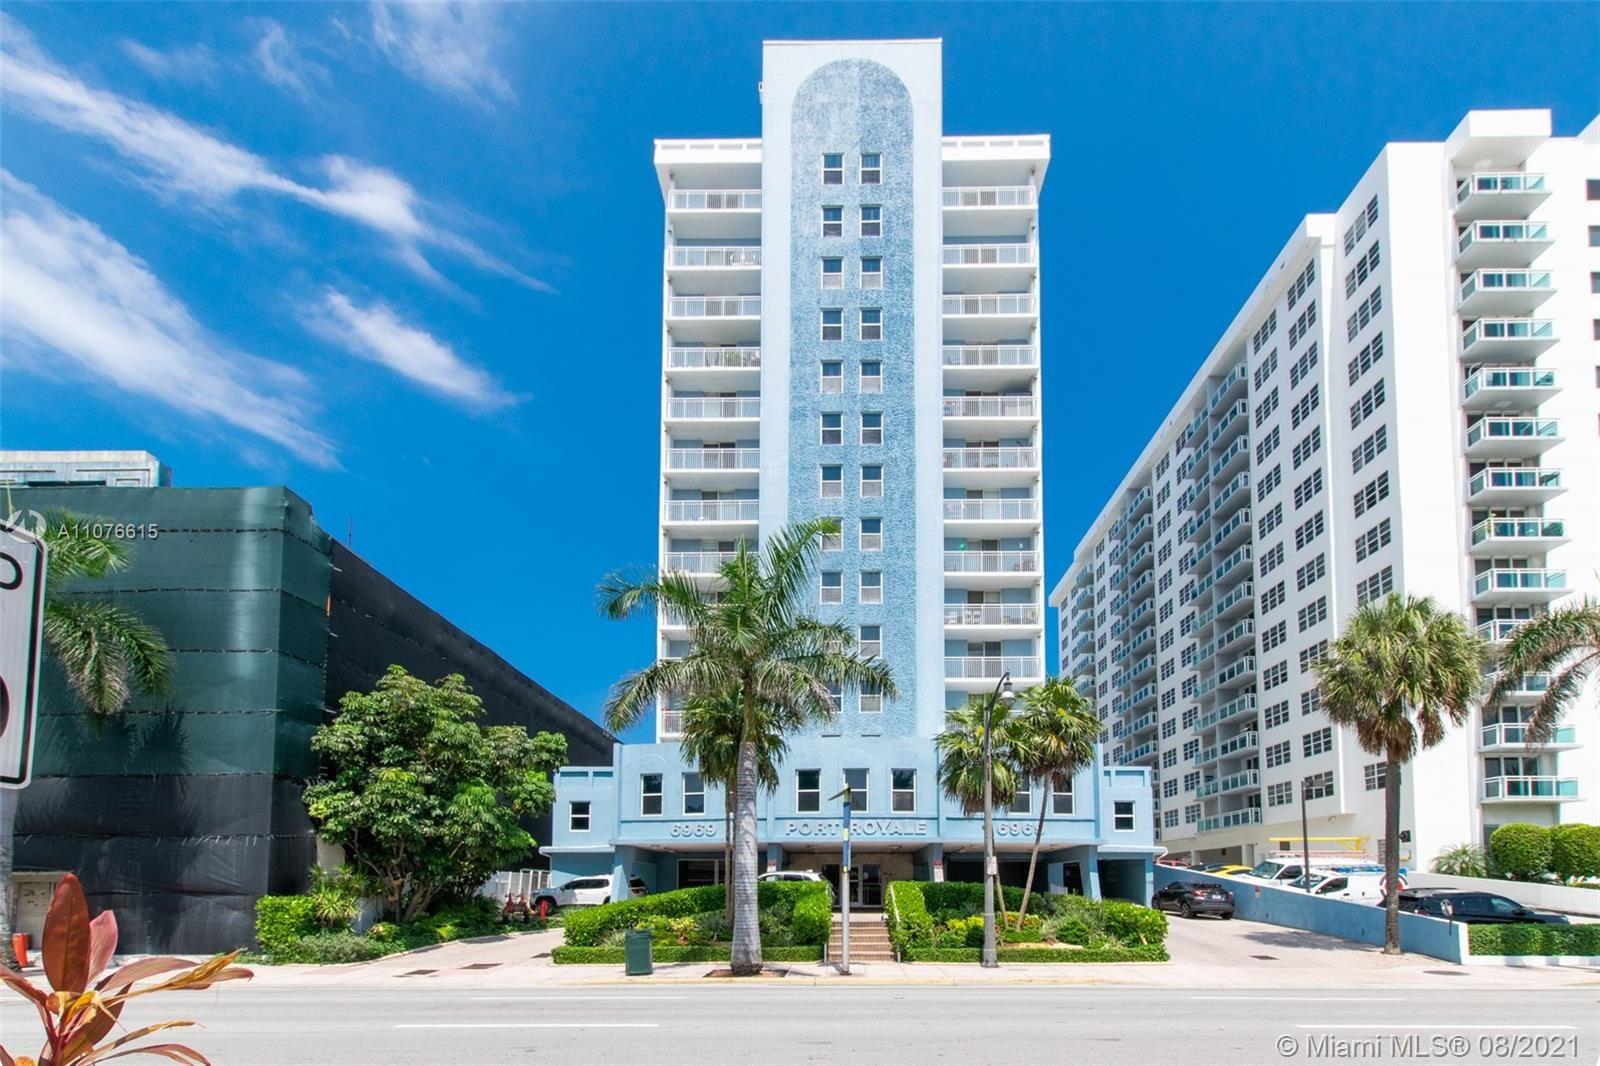 Photo for 6969 Collins Ave #1406, Miami Beach, FL 33141 (MLS # A11076615)